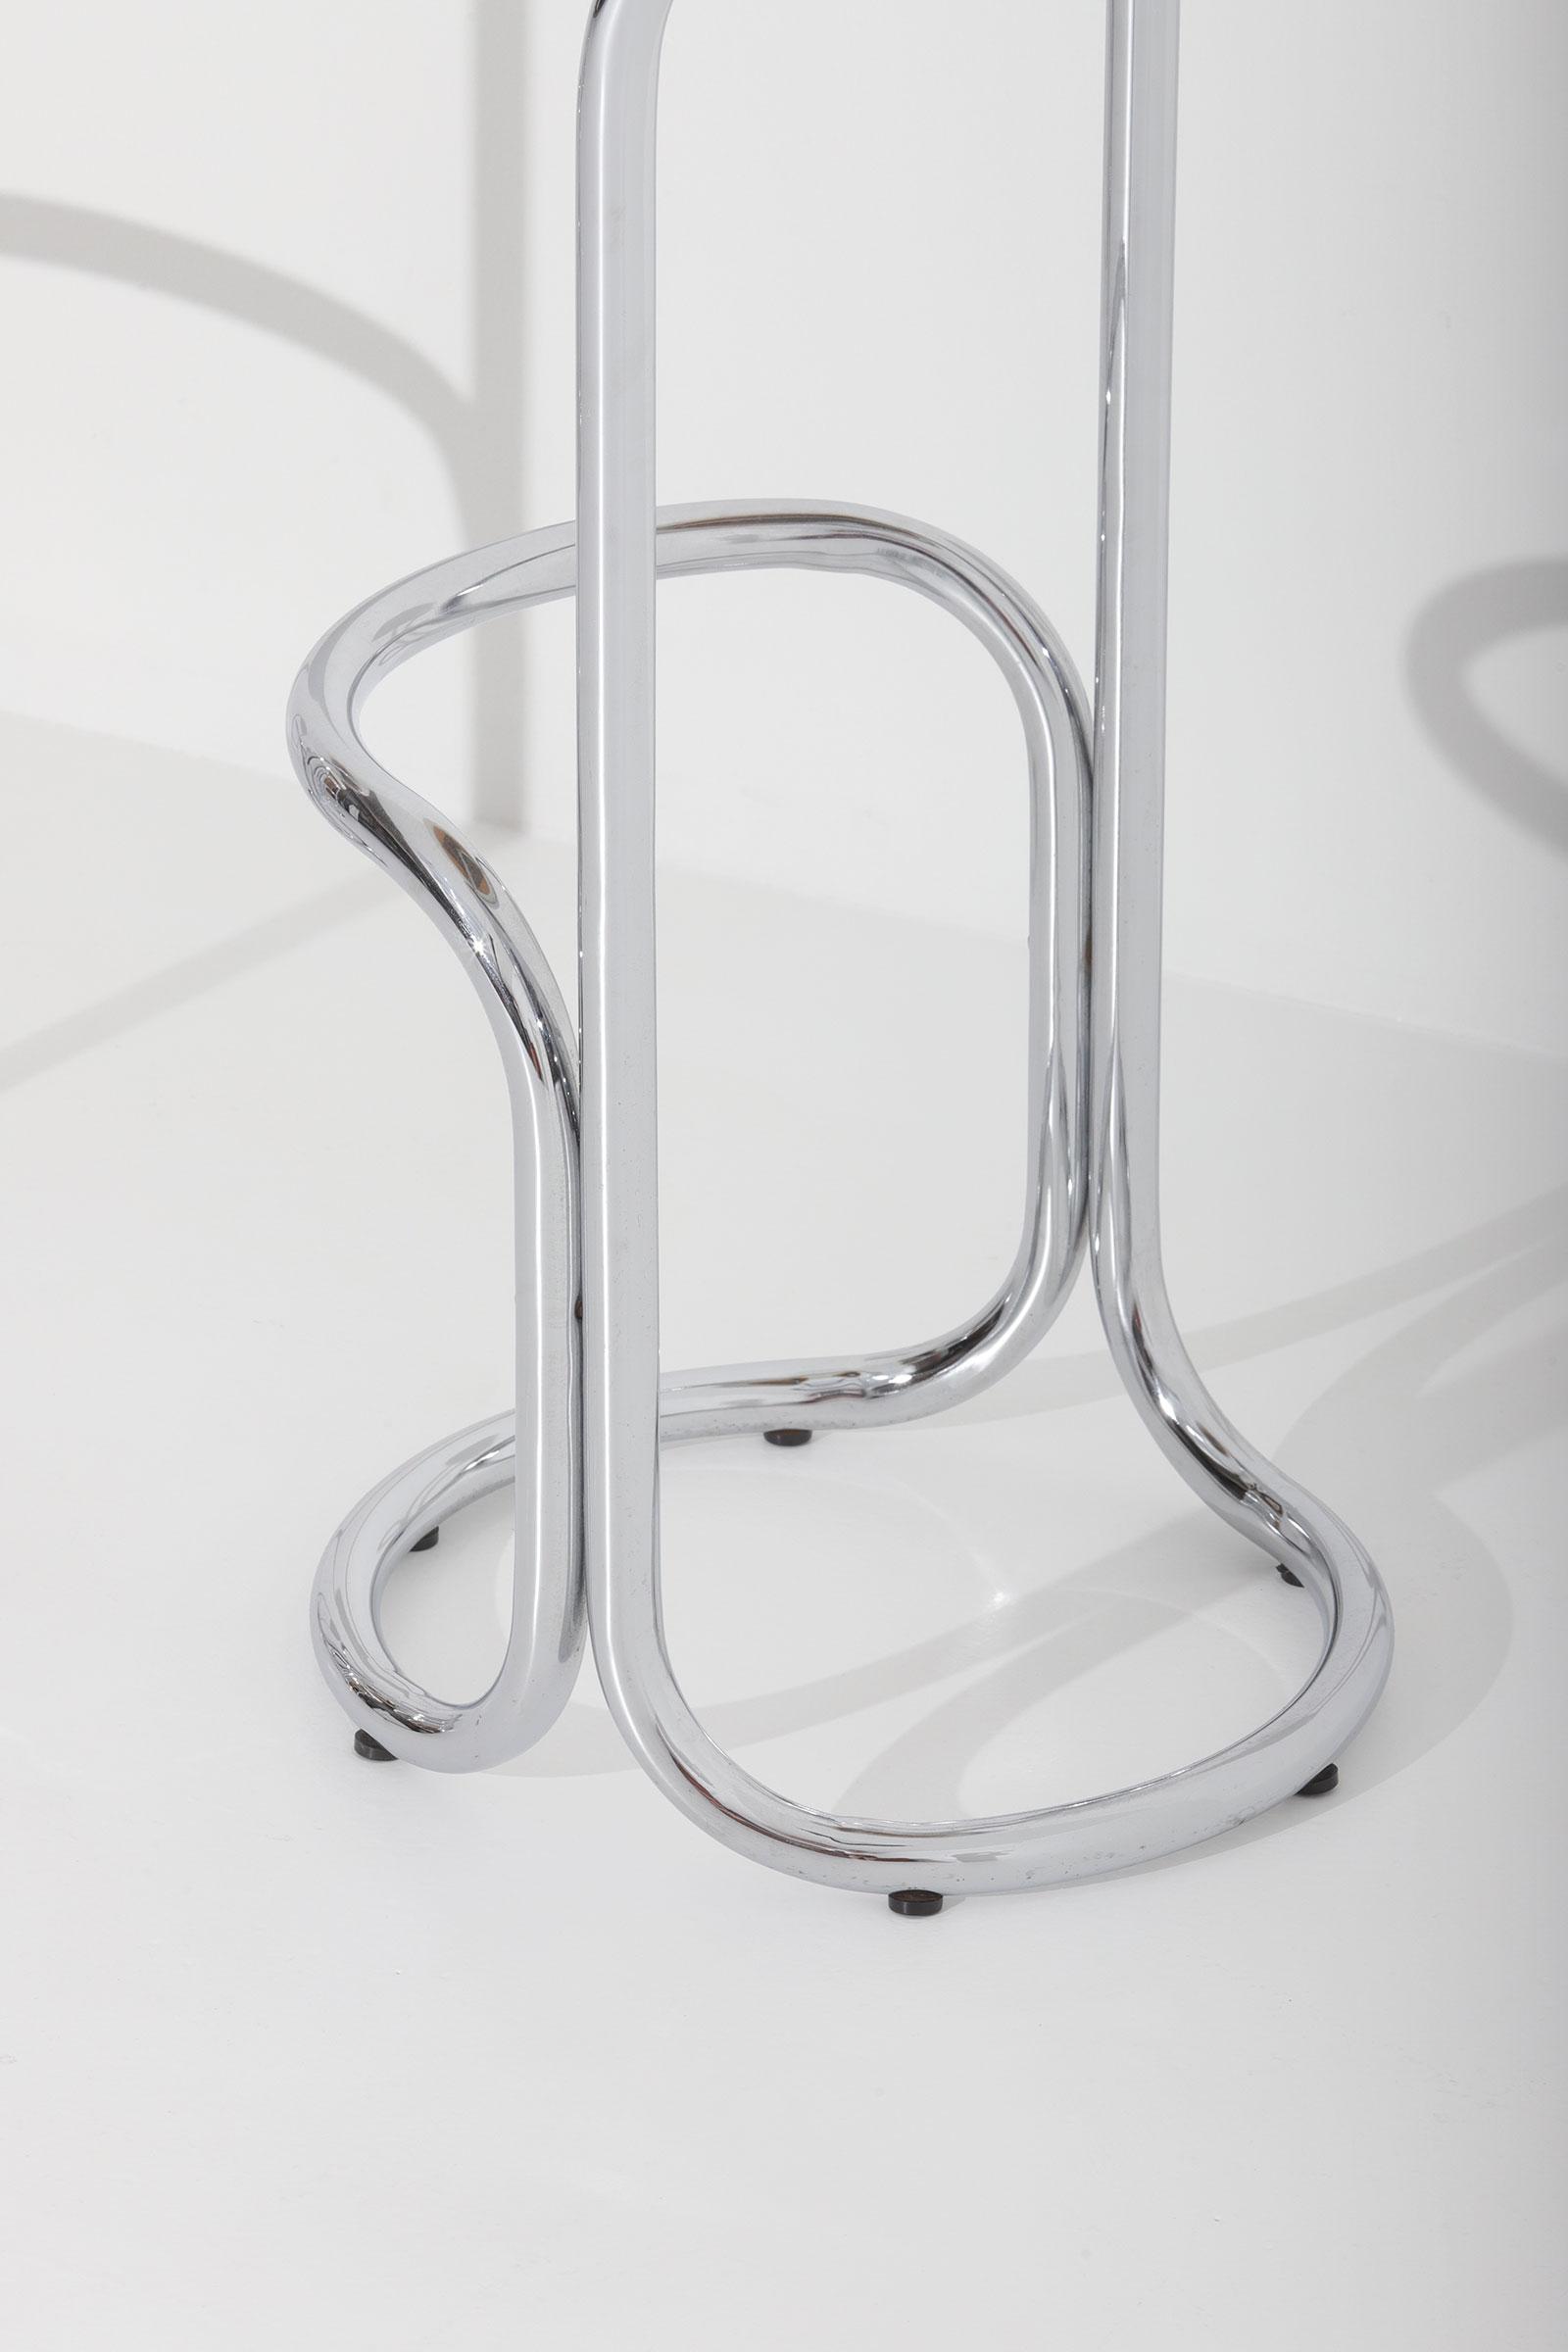 Chrome Bar Stools  With Plastic Fabric Seatsimage 5